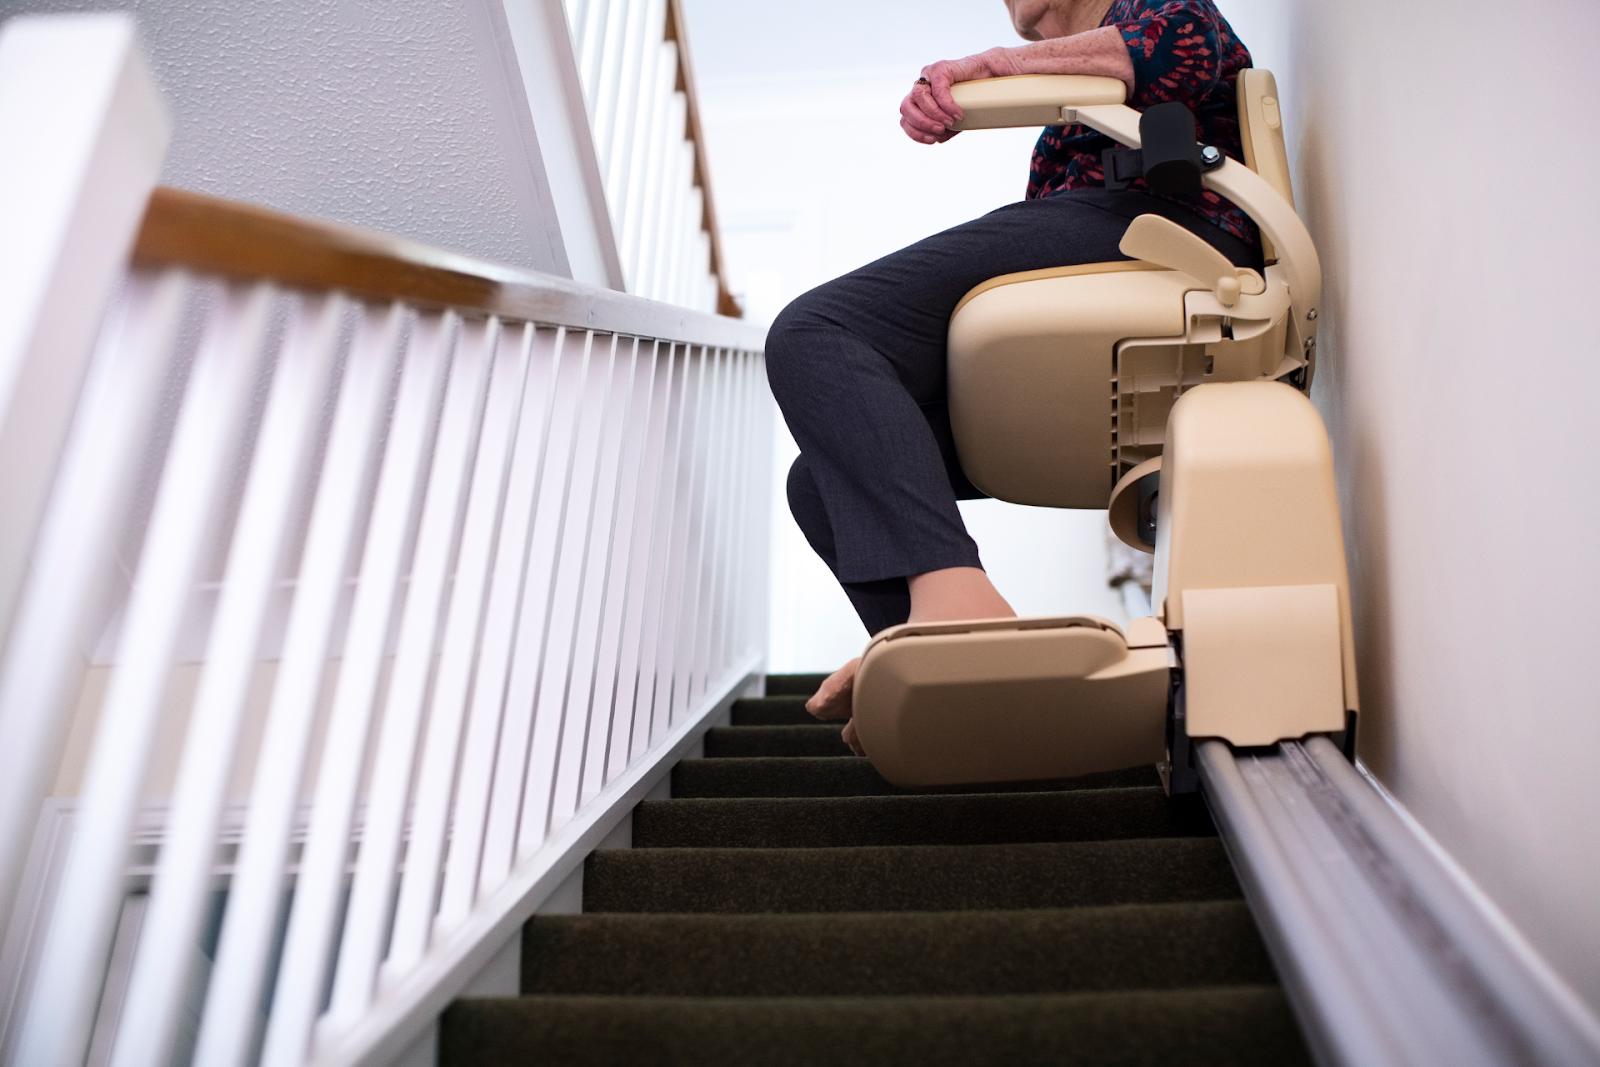 elderly woman using stairlift